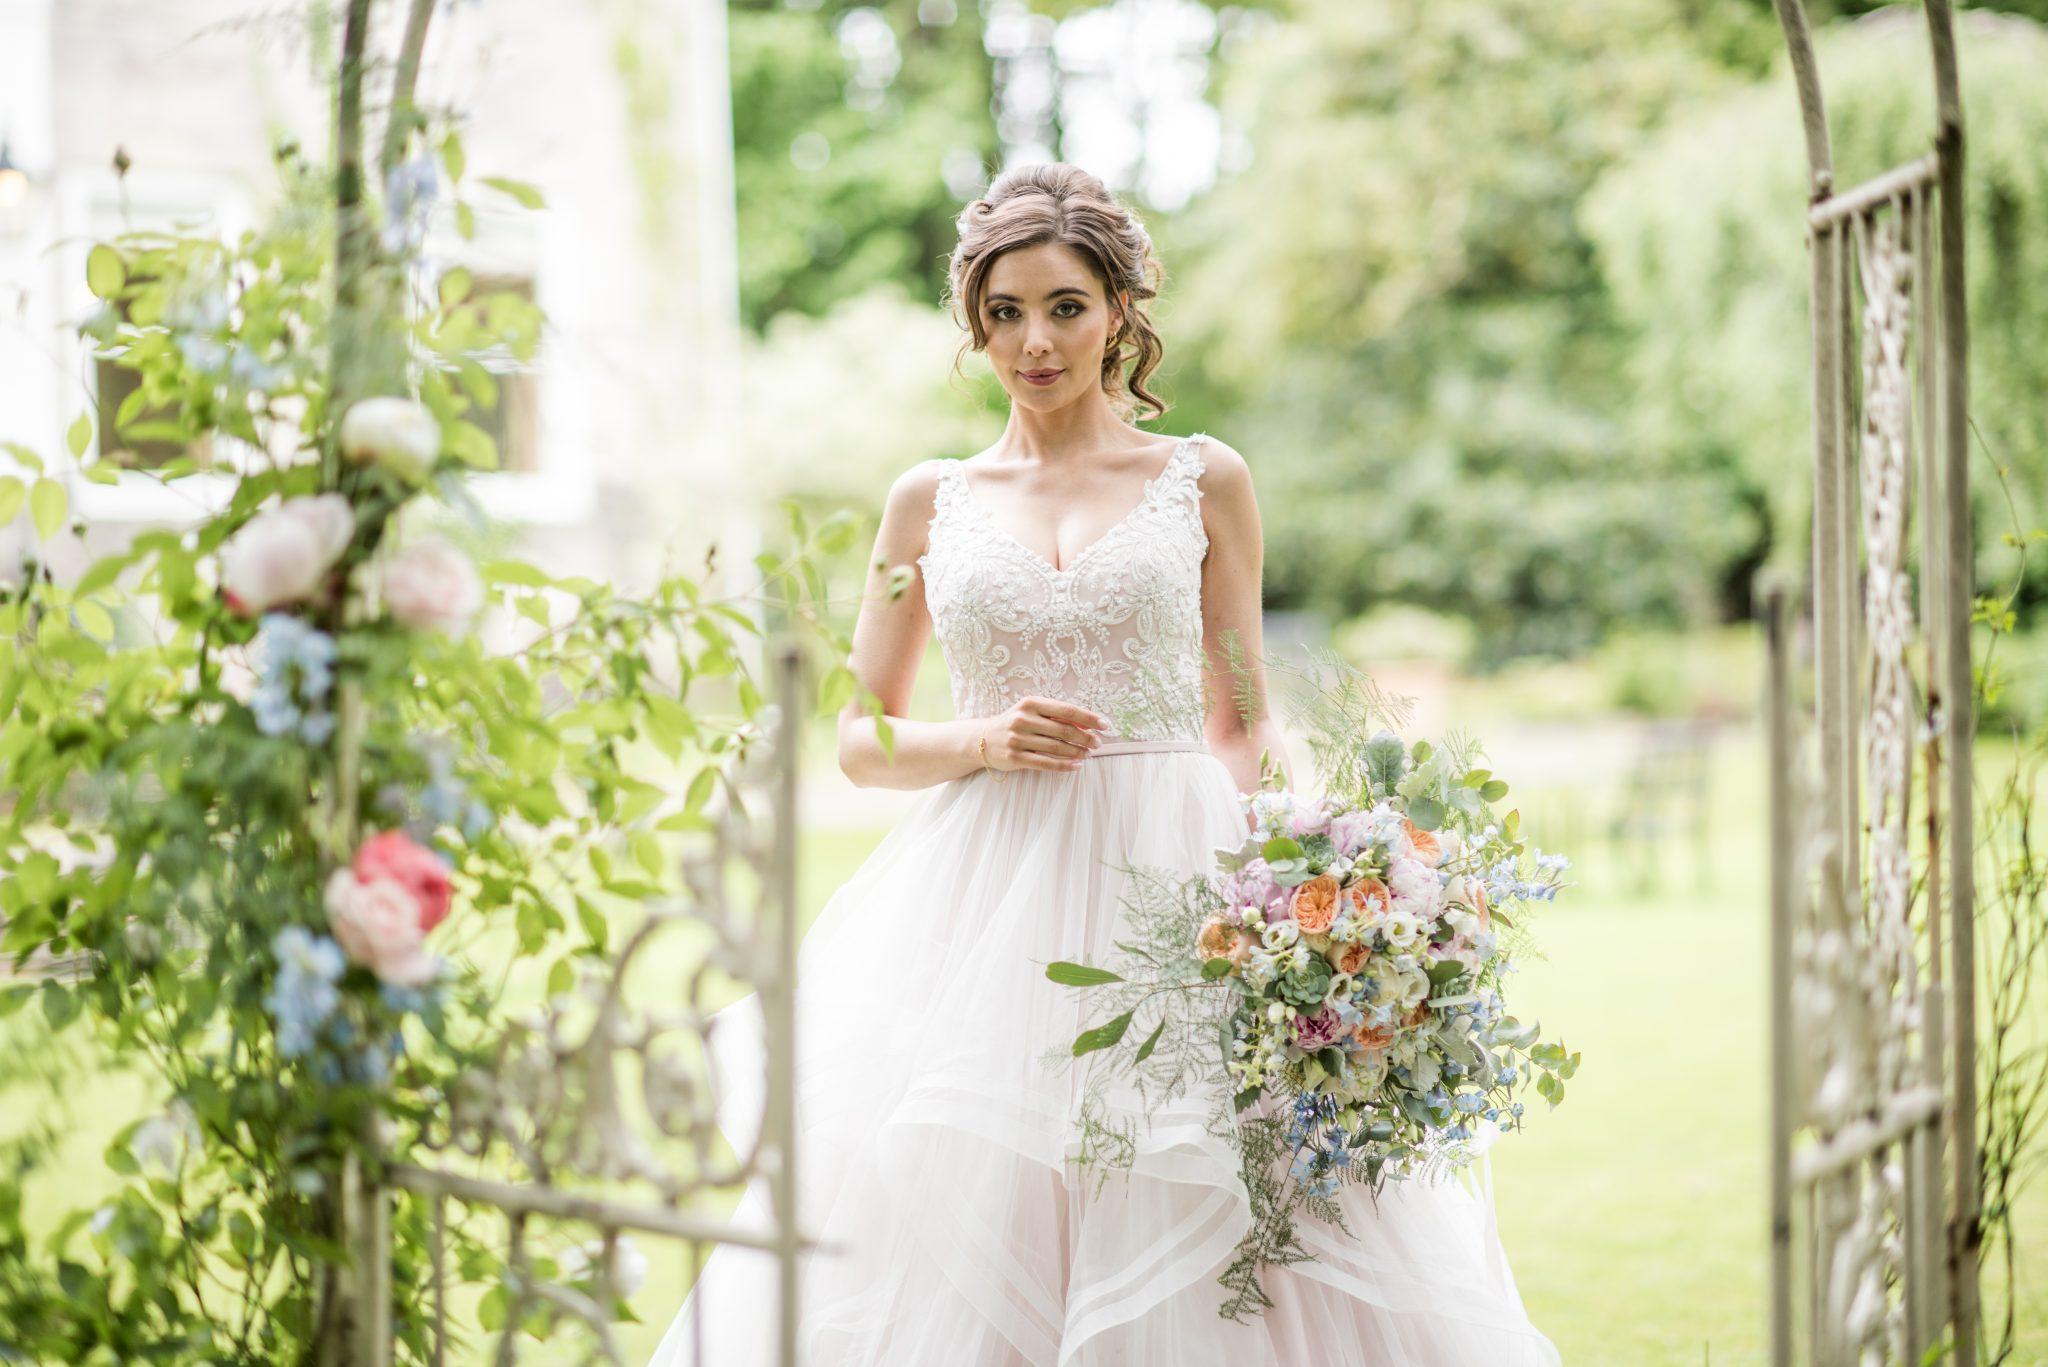 The Old Deanery: A Romantic English Garden Wedding